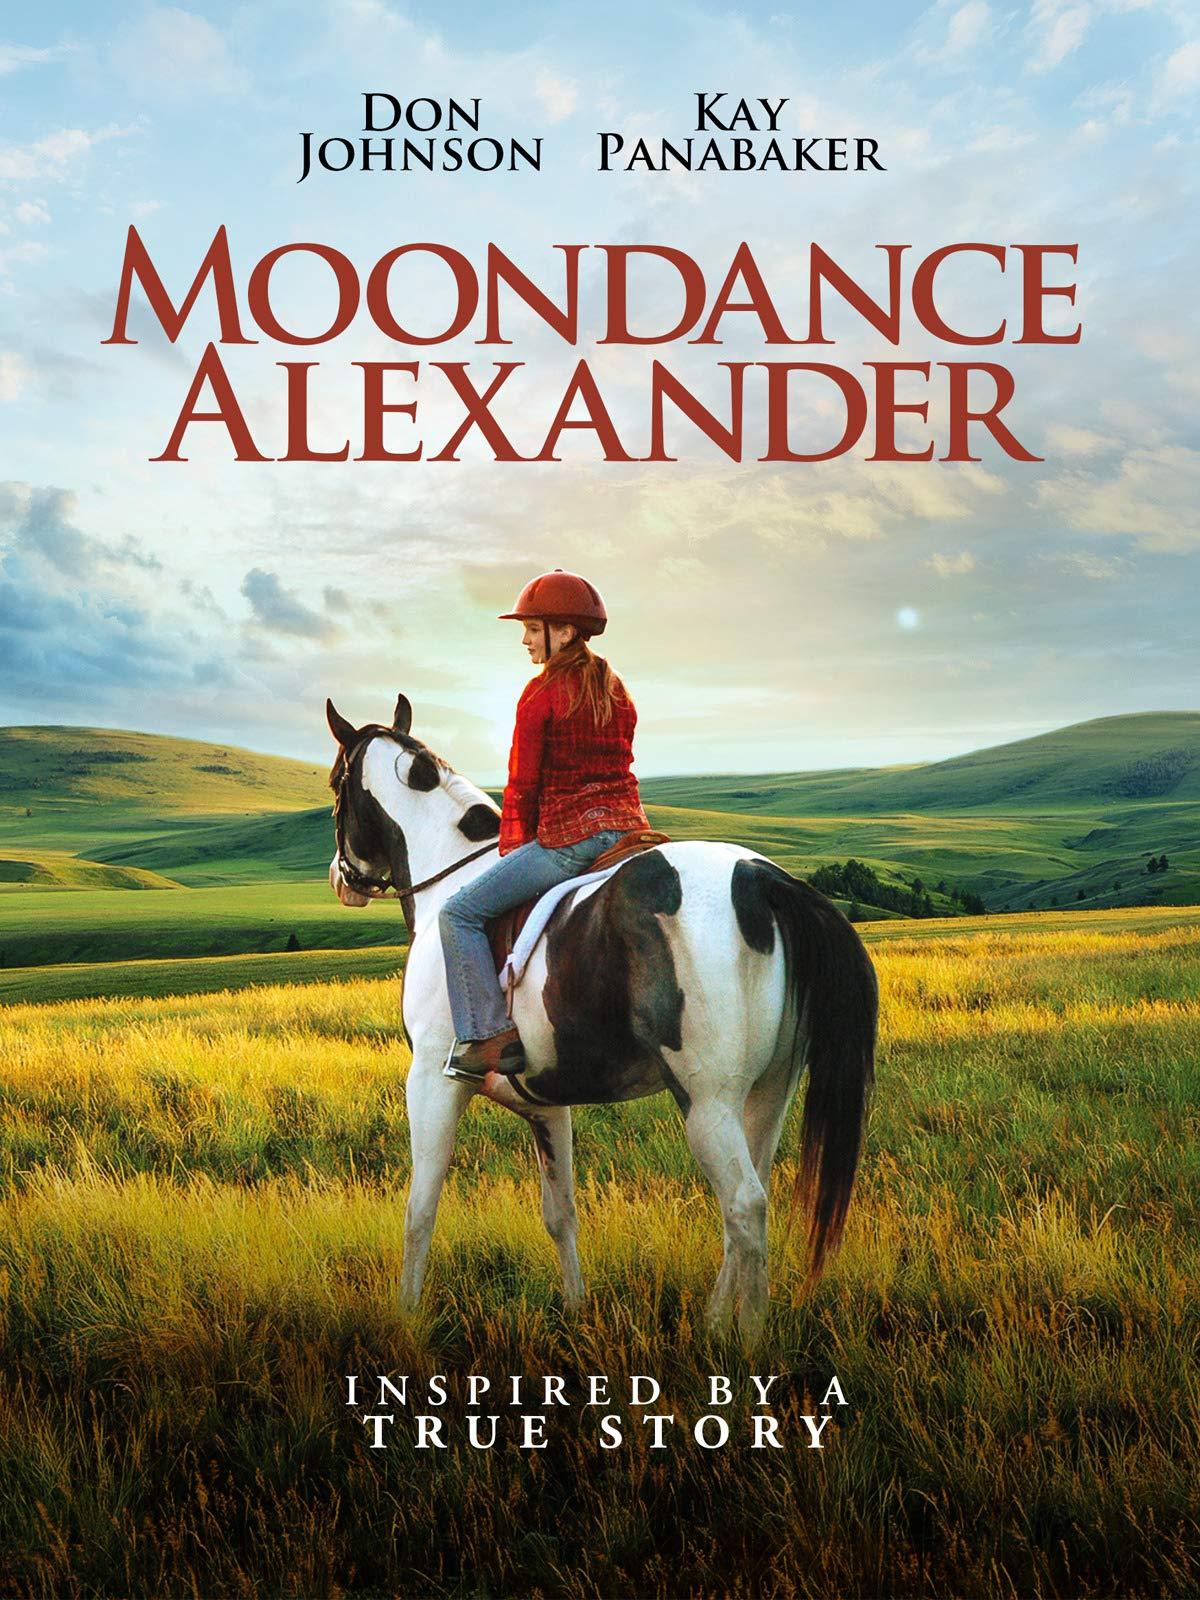 Moondance Alexander on Amazon Prime Video UK